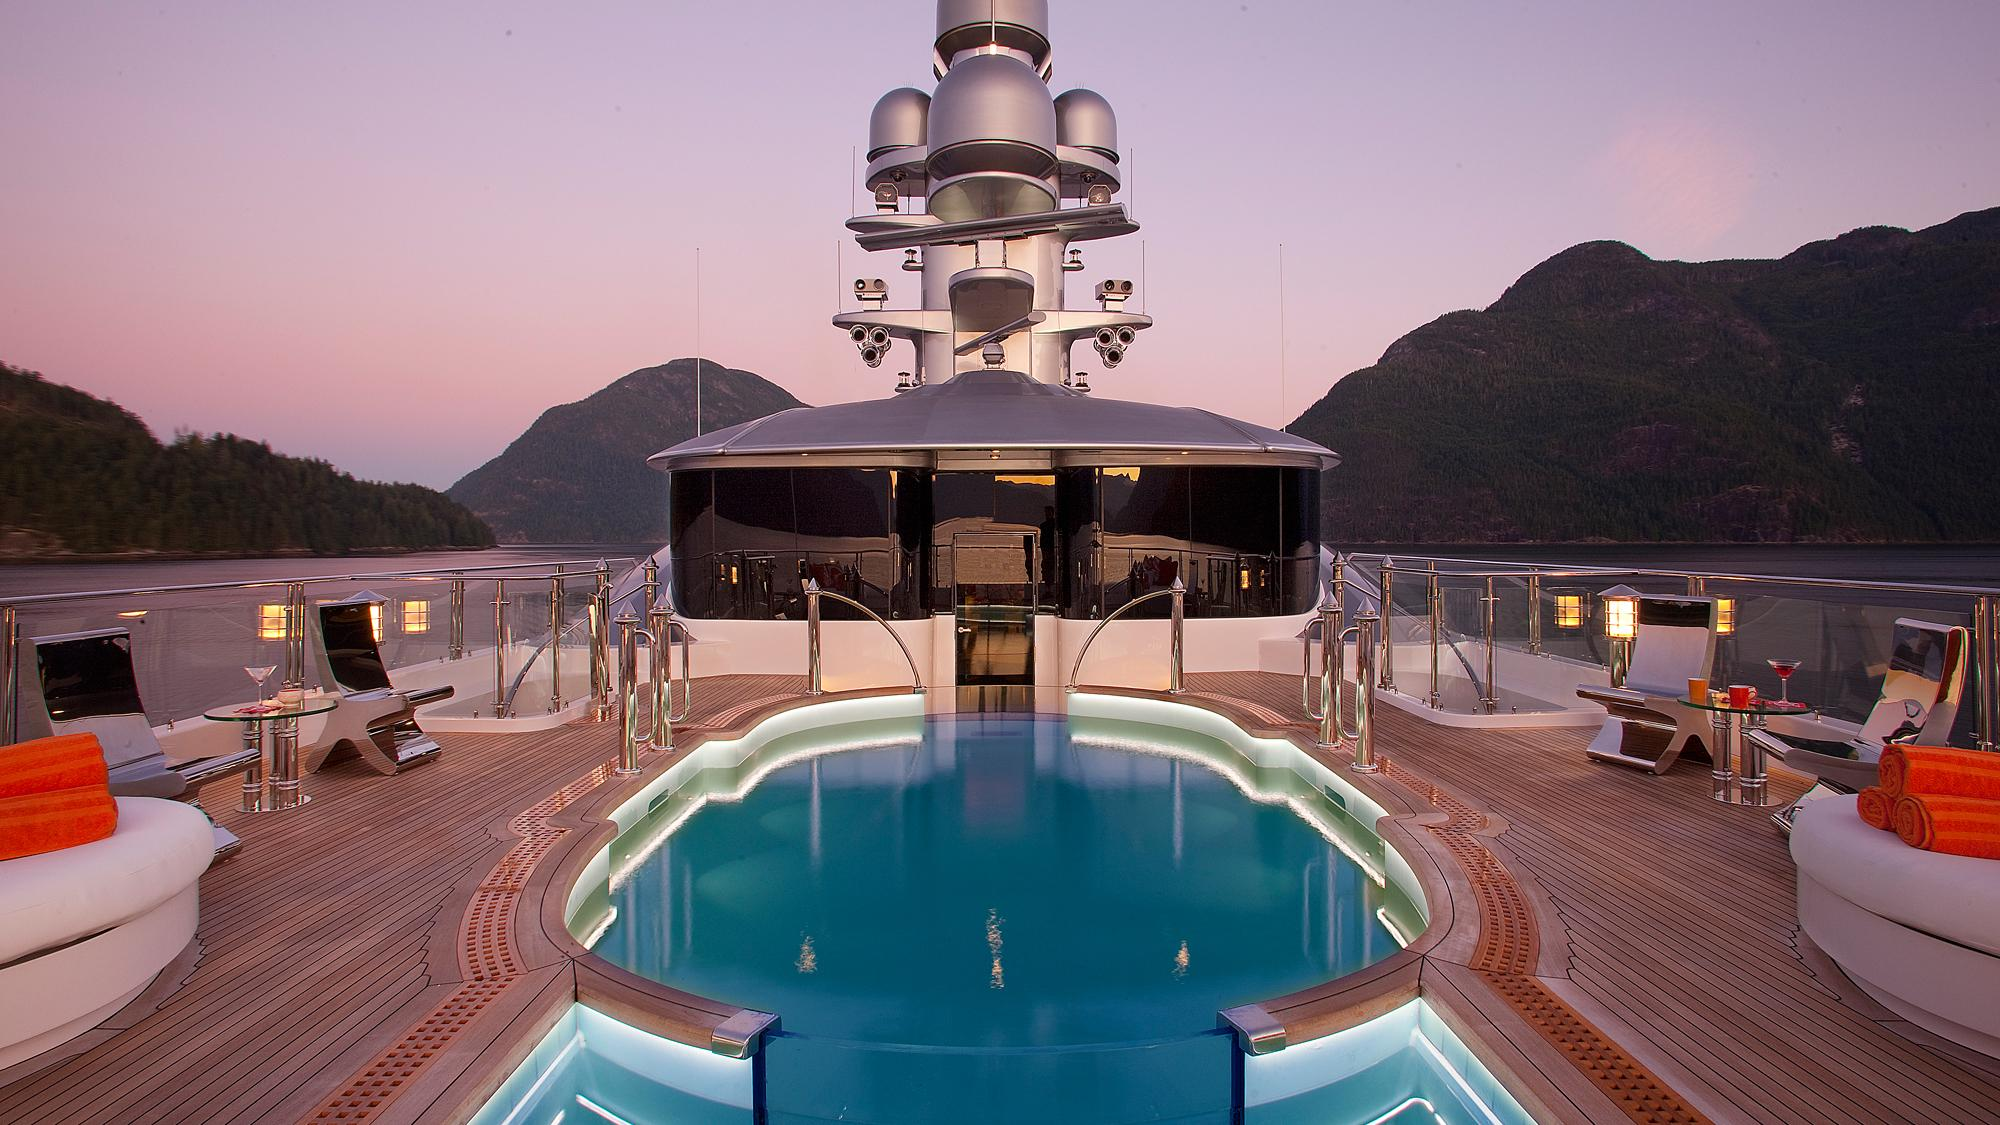 Attessa-IV-motor-yacht-hayashikane-1999-101m-sundeck